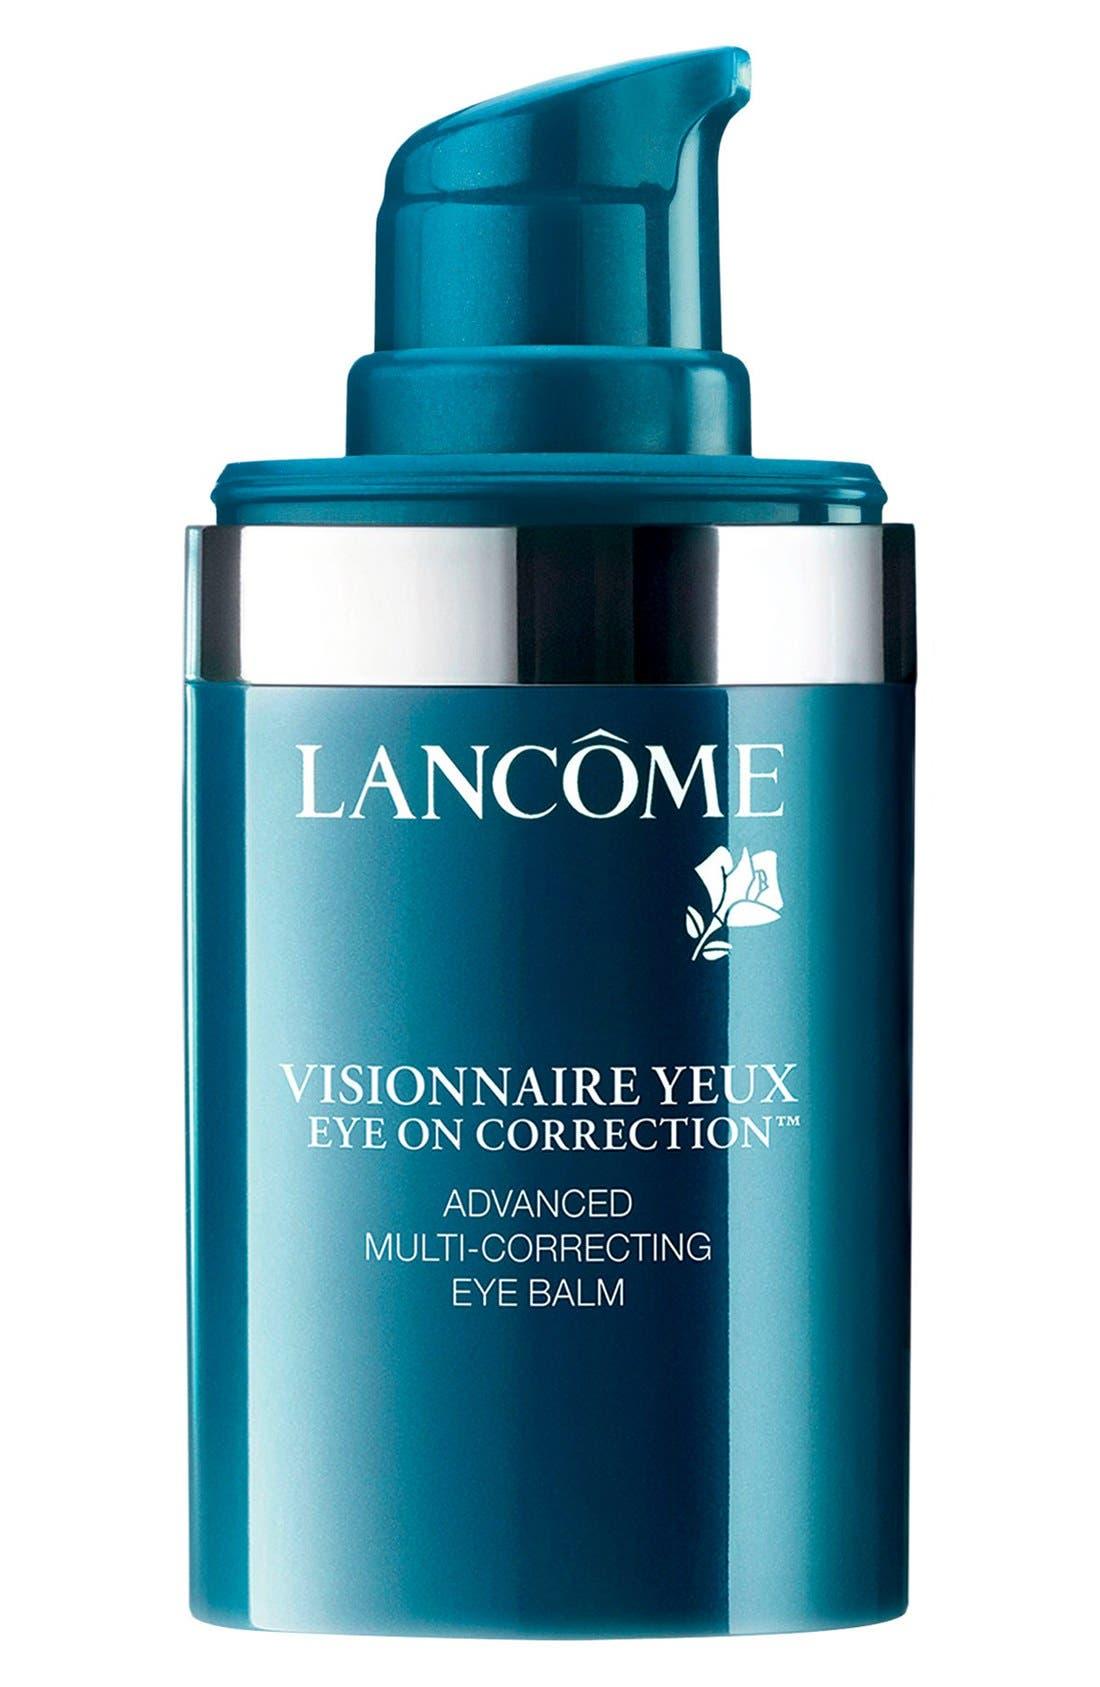 Lancôme Visionnaire Yeux Eye on Correction® Advanced Multi-Correcting Eye Balm